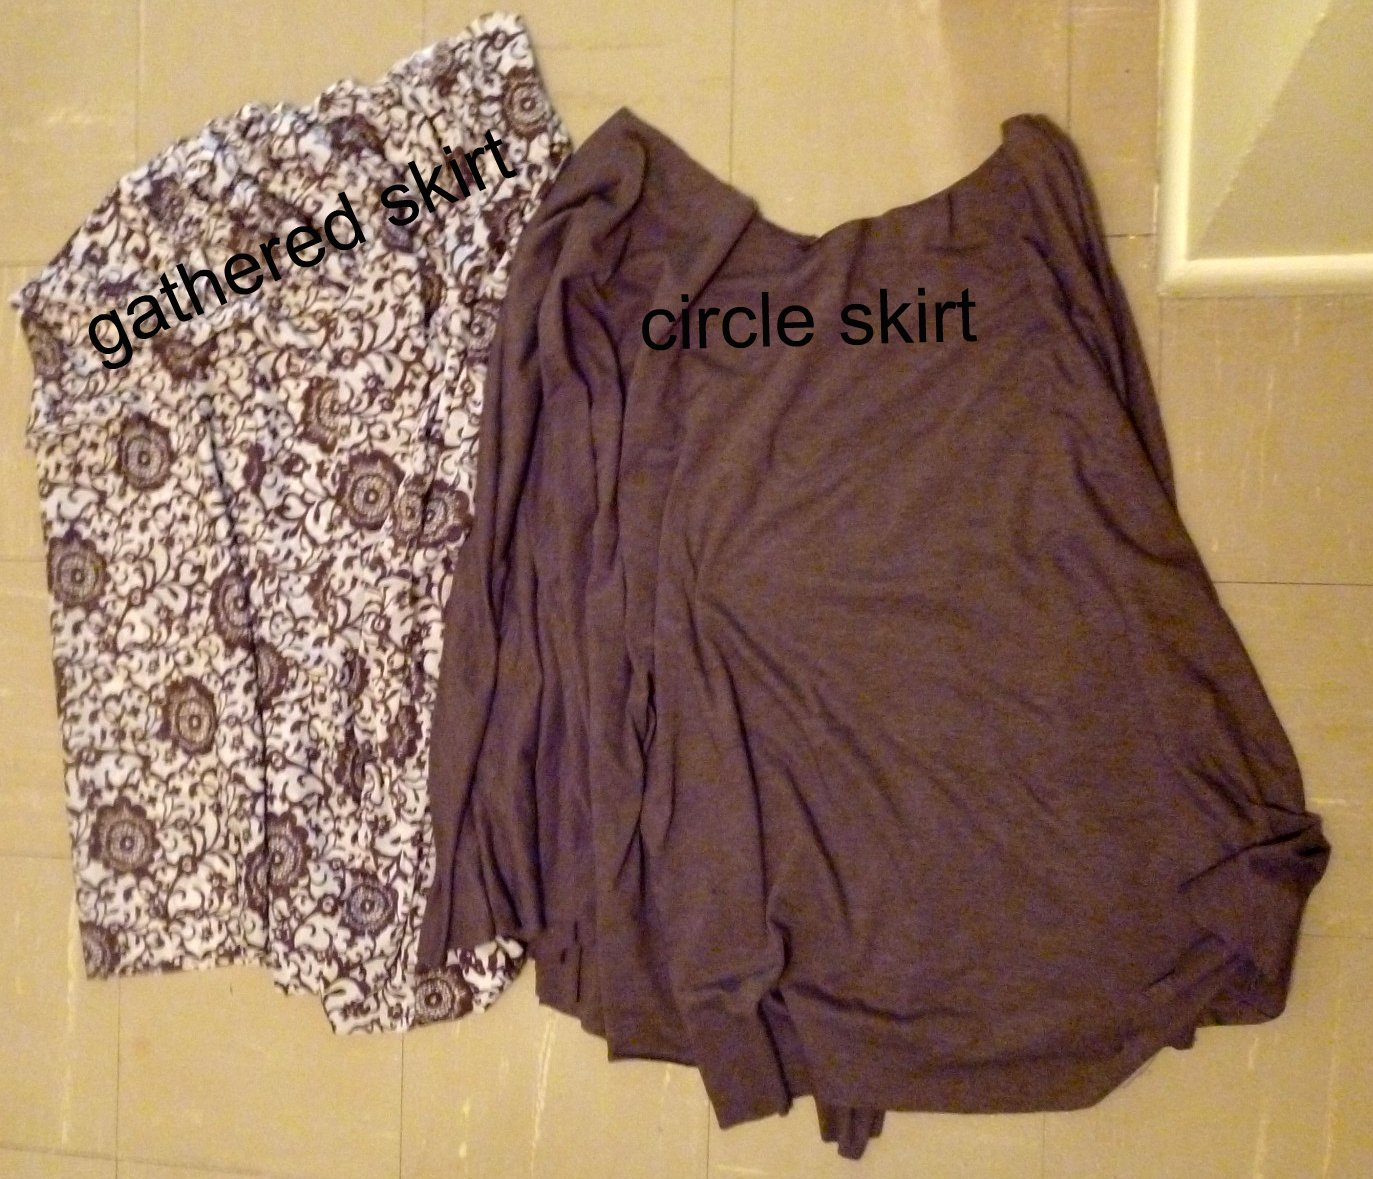 Reversible Skirt With Knit Waistband Tutorial - Heather Handmade